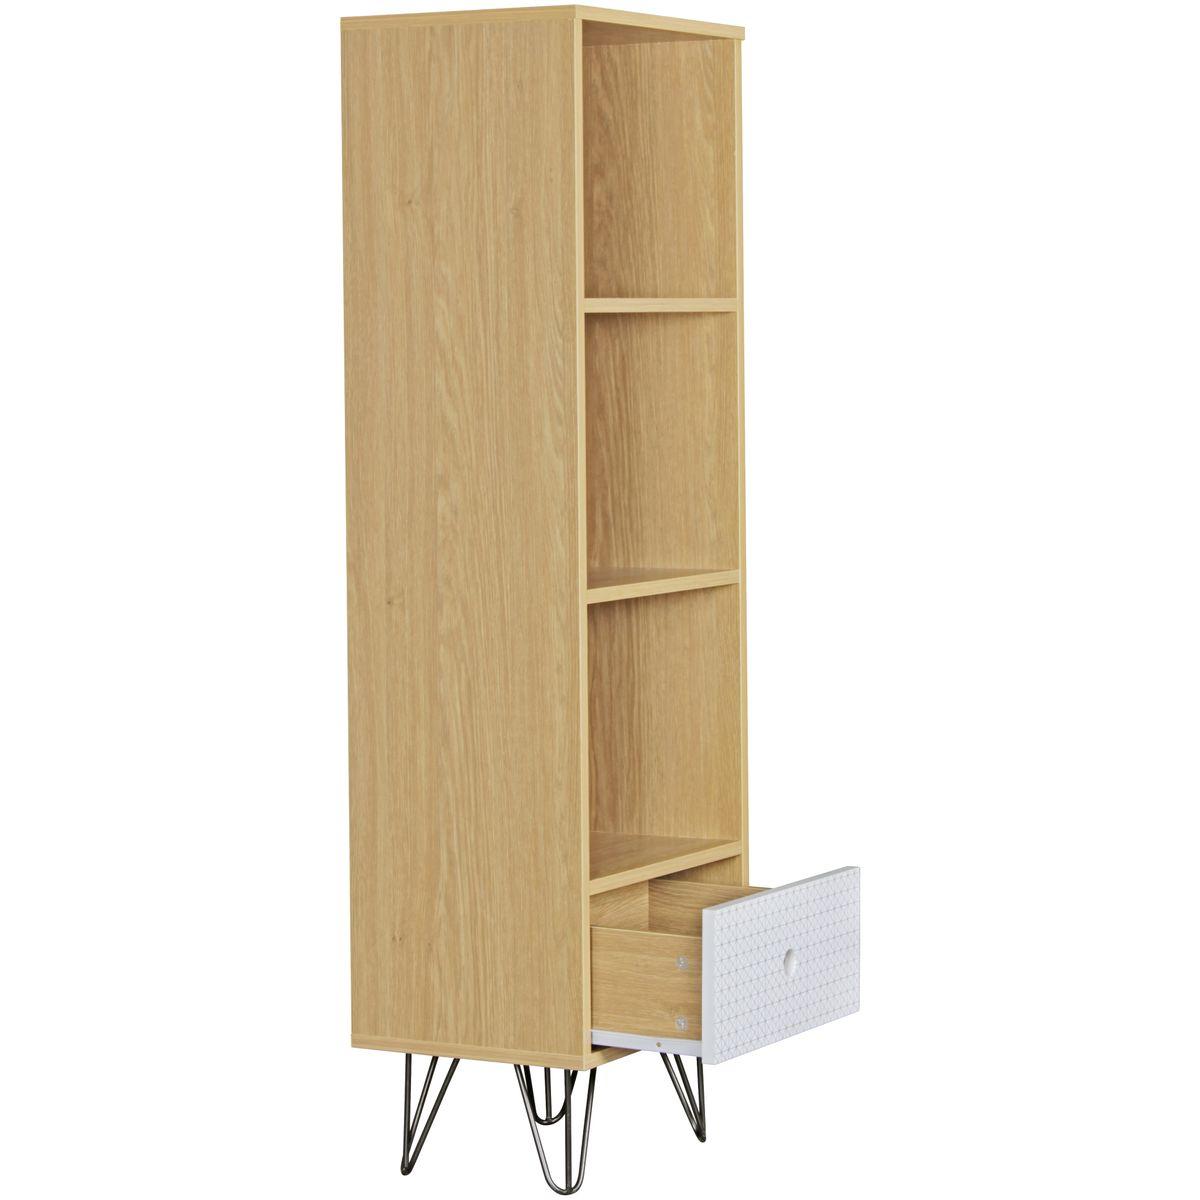 finebuy b cherregal kuusamo mit schublade retro design holz 40 x 130 x 30 cm standregal f r. Black Bedroom Furniture Sets. Home Design Ideas